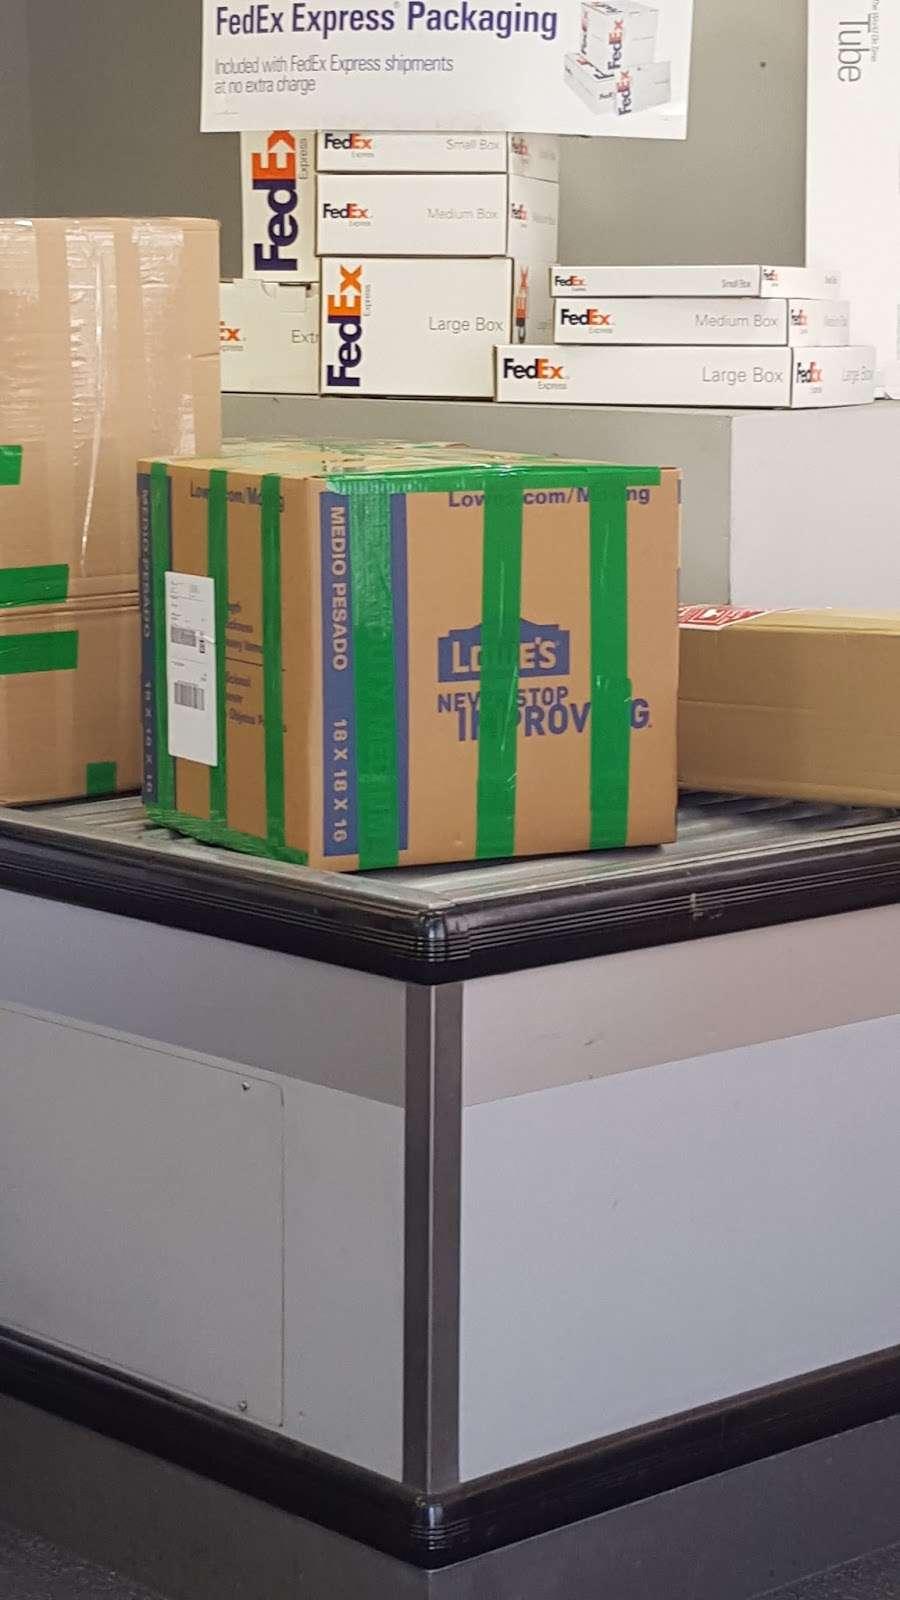 FedEx Ship Center - store    Photo 7 of 10   Address: 12600 S Prairie Ave, Hawthorne, CA 90250, USA   Phone: (800) 463-3339